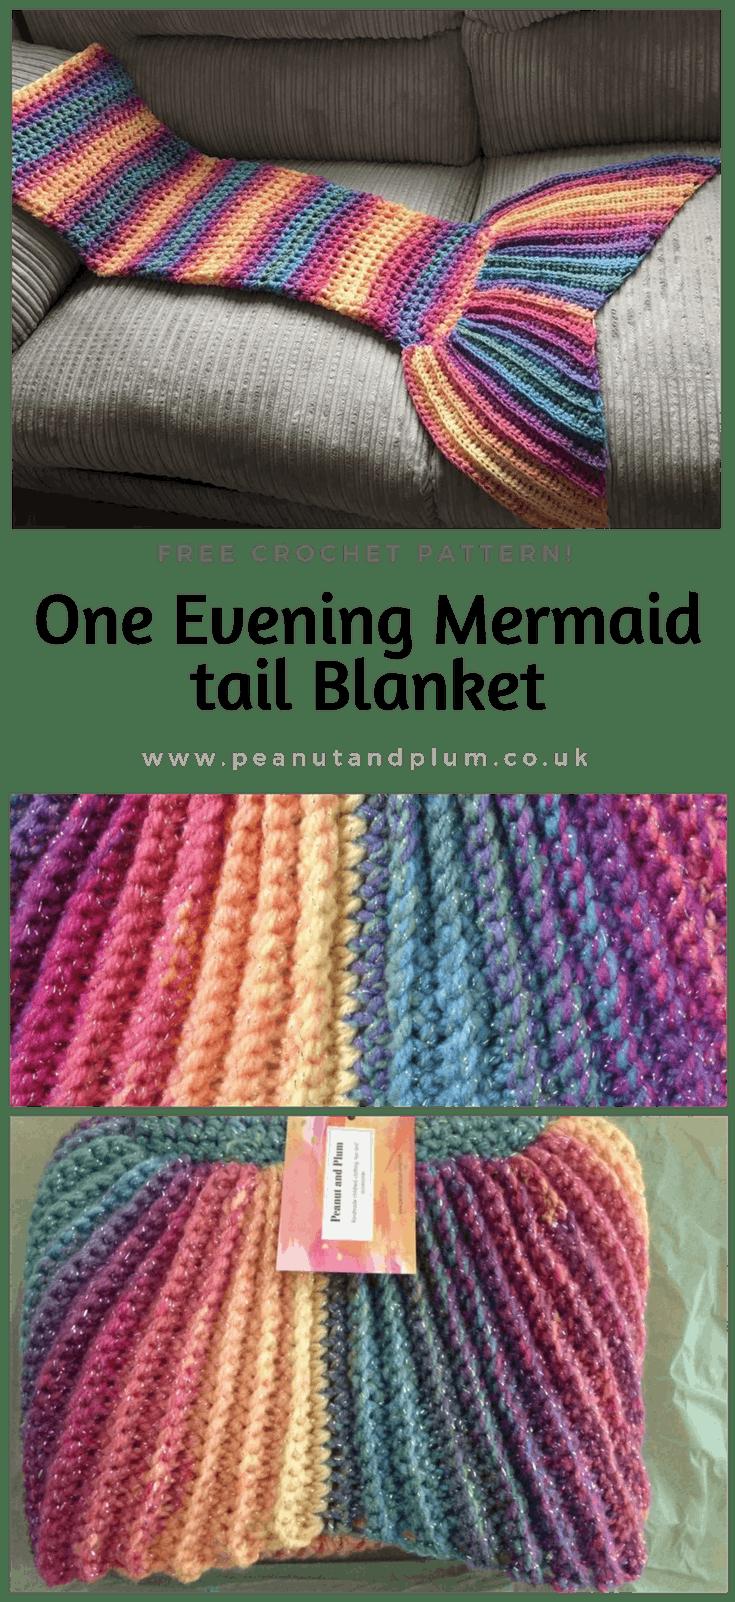 One evening Crochet Mermaid tail blanket pattern - | Cola de sirena ...